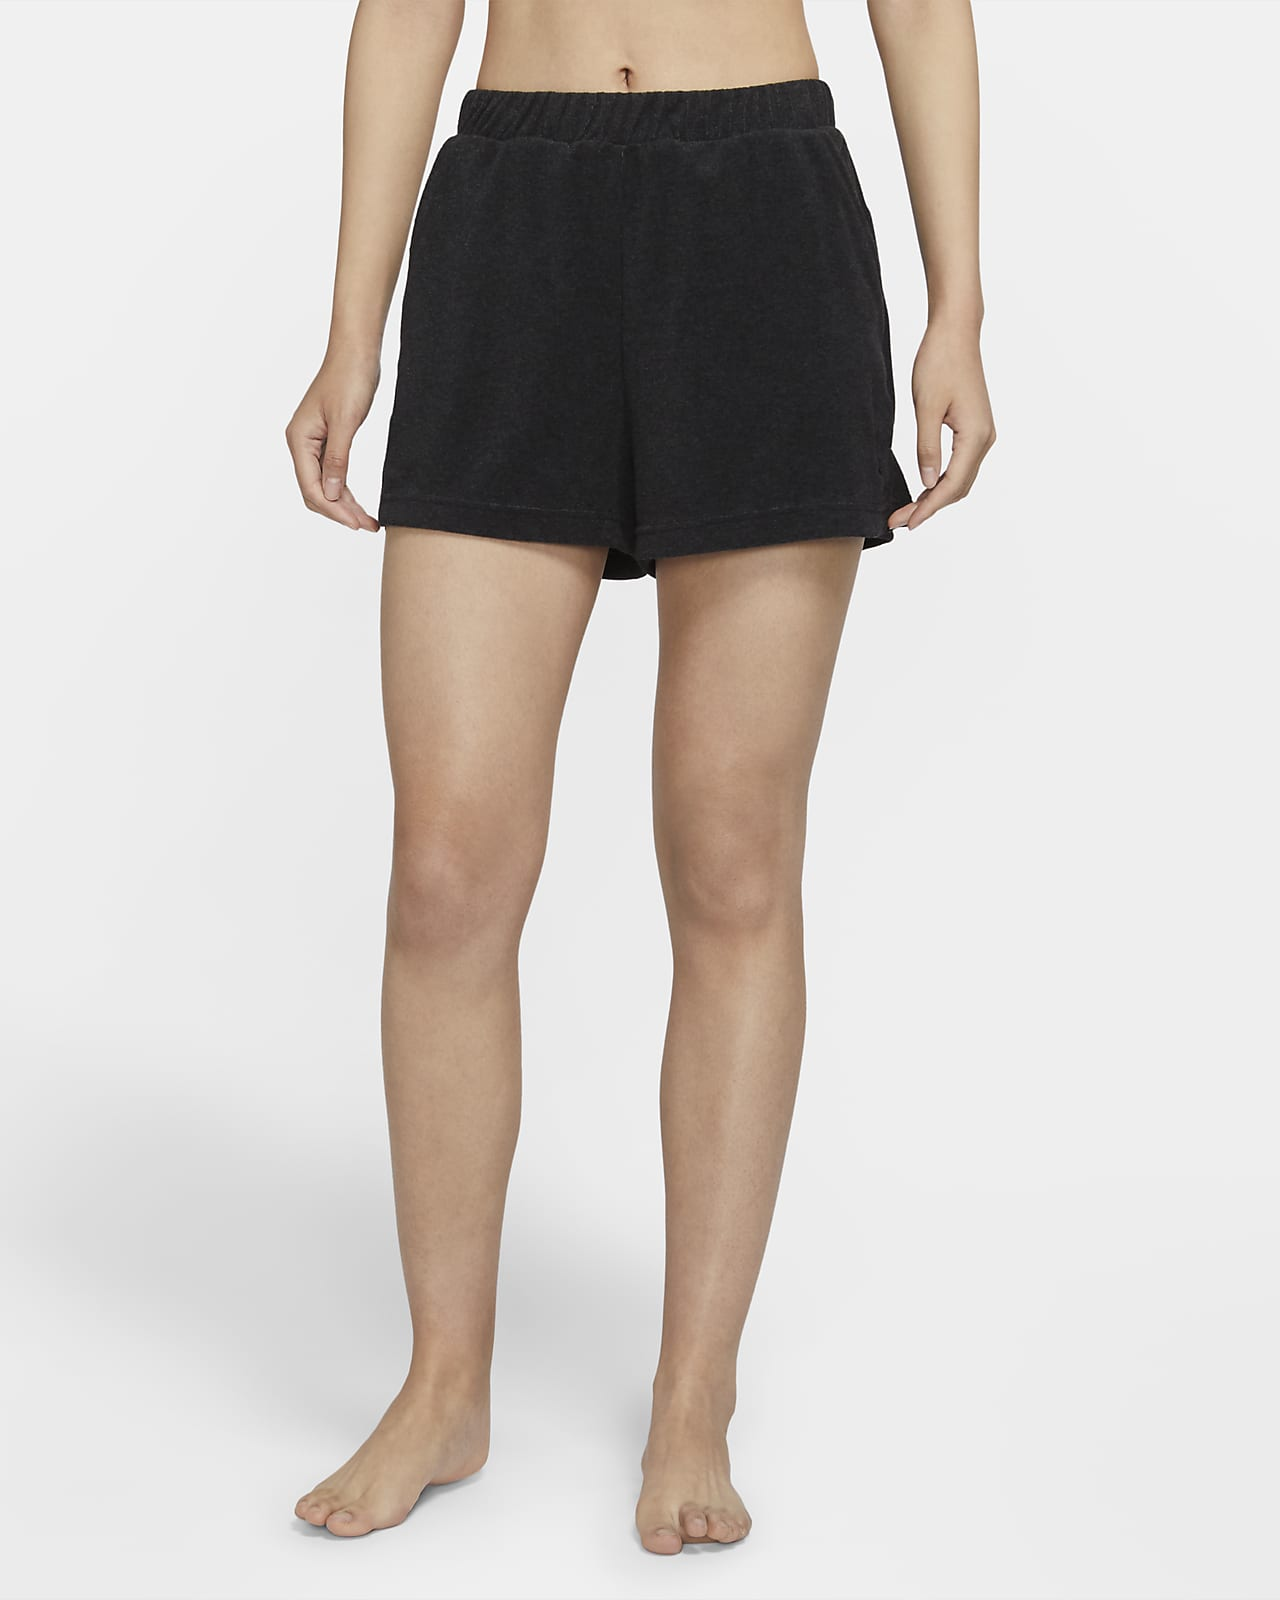 Nike Yoga Women's Shorts